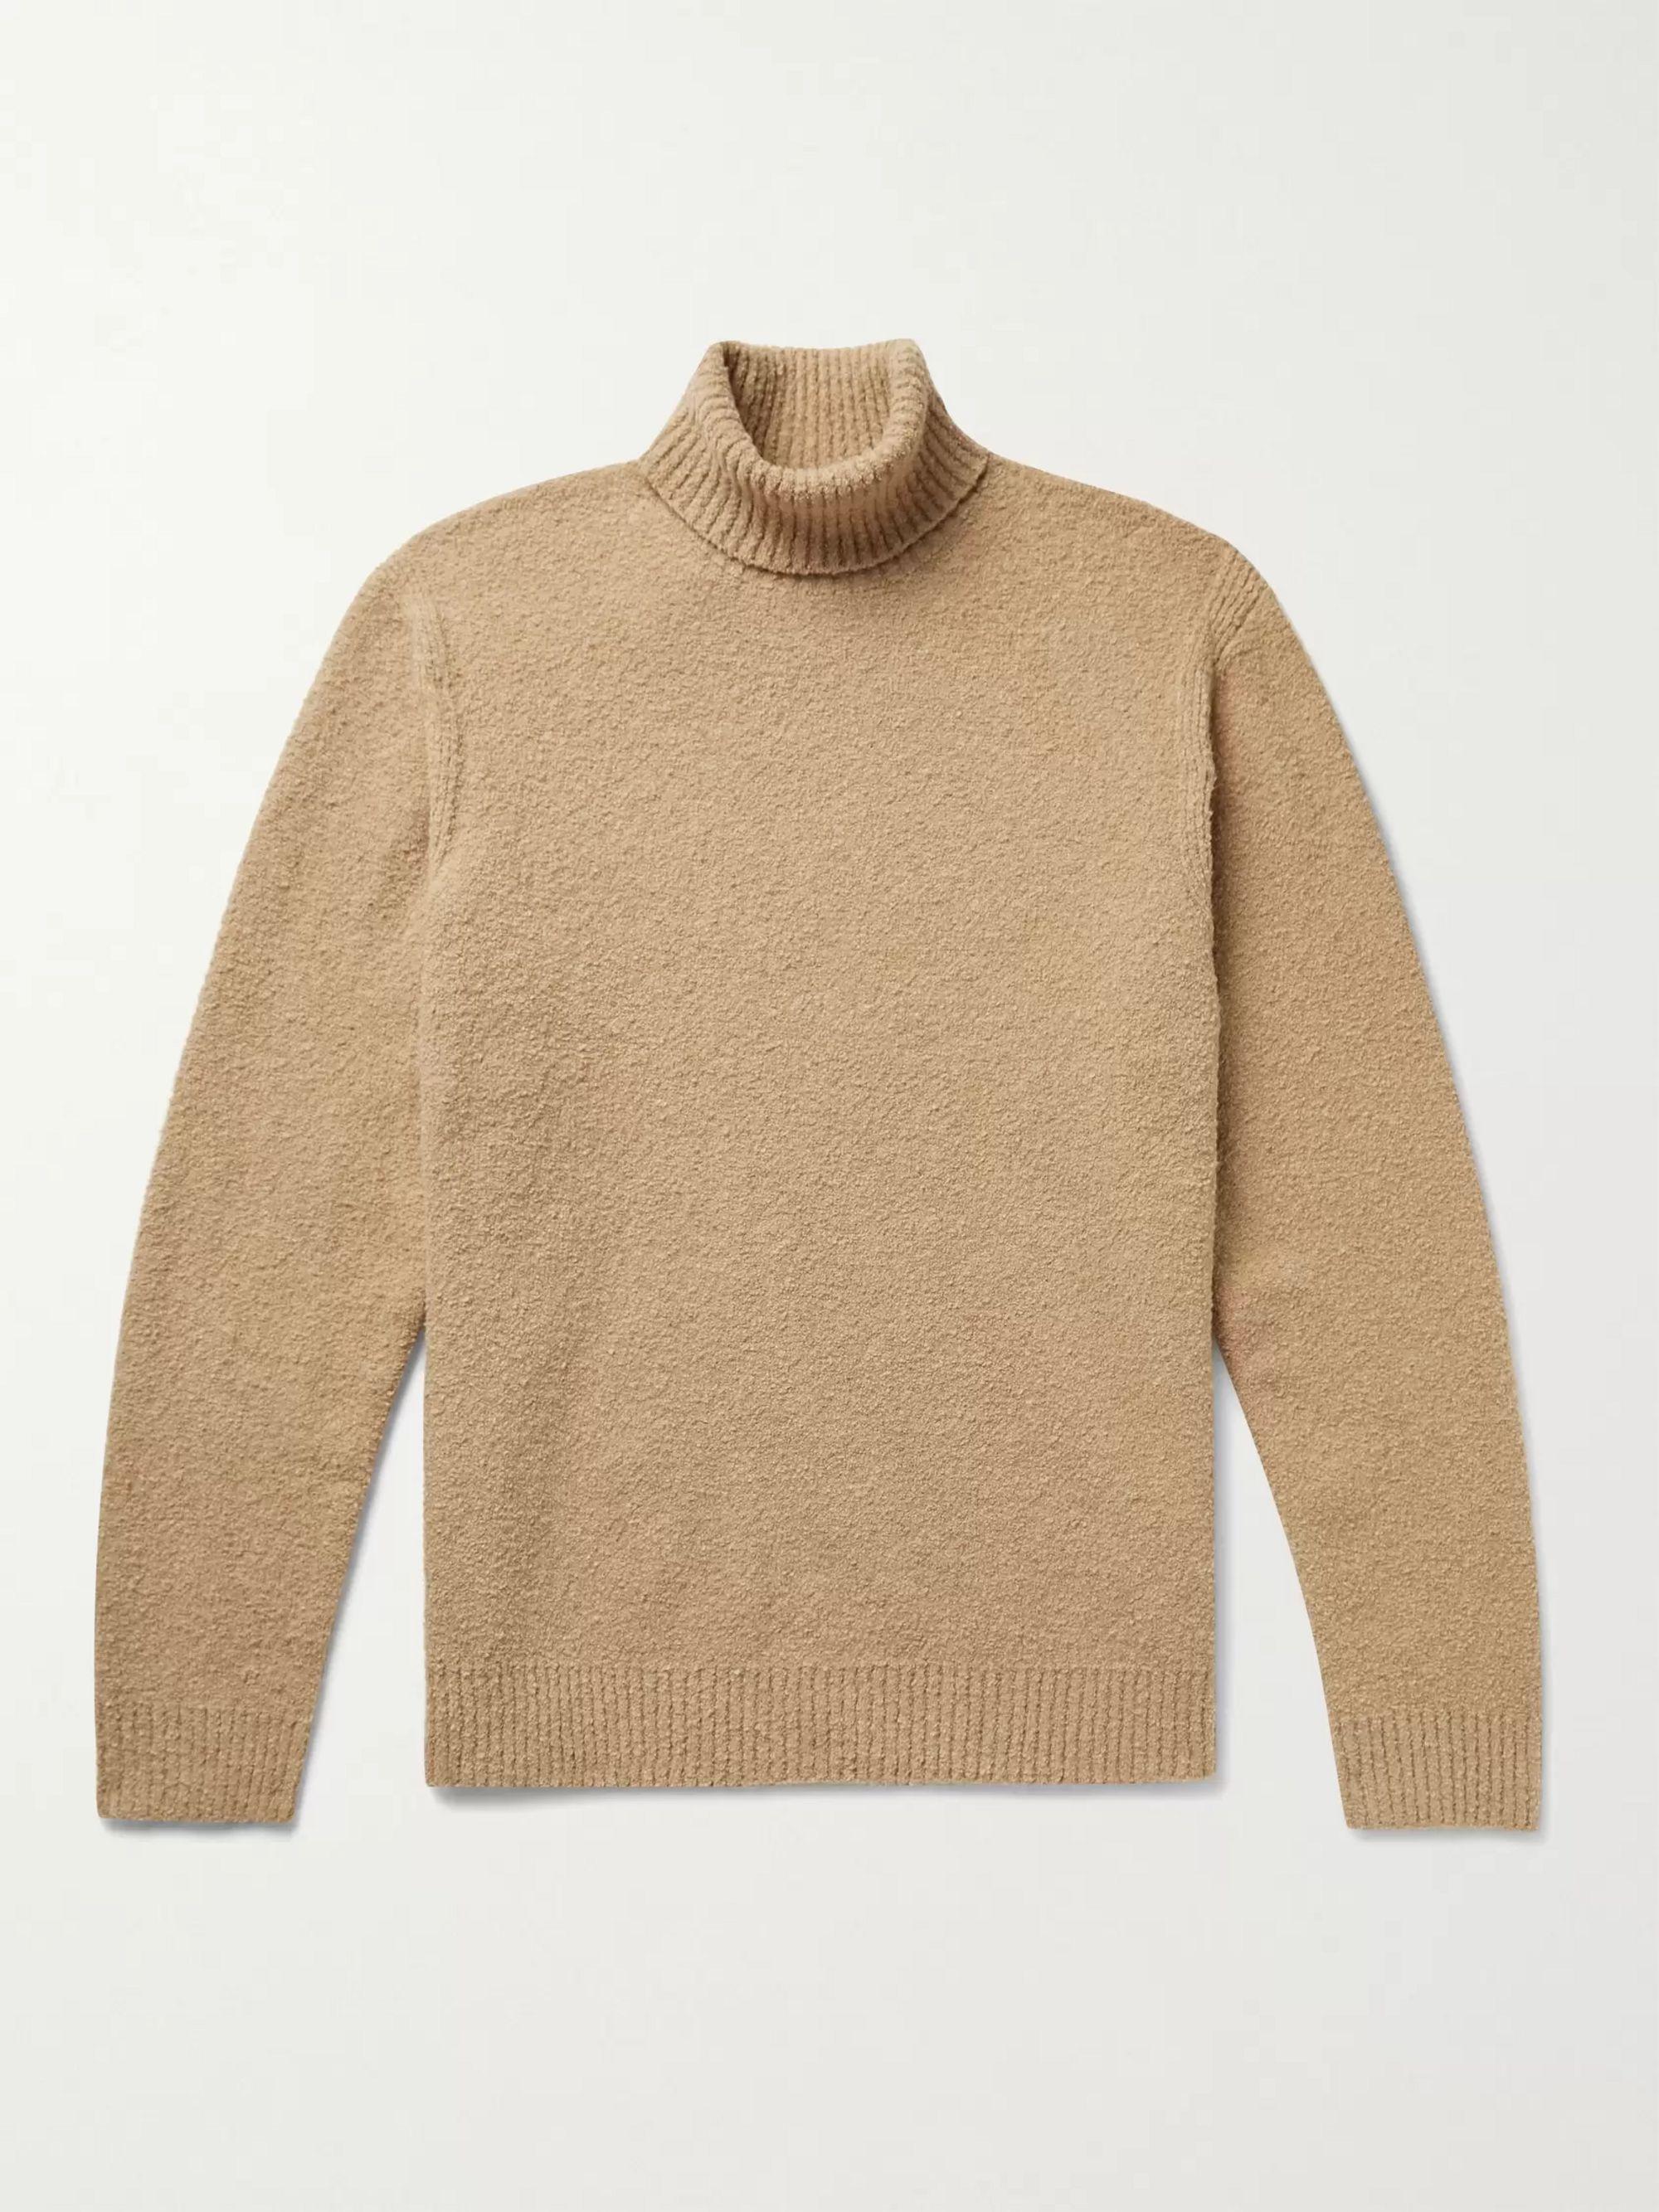 CLUB MONACO Cotton-Blend Boucle Rollneck Sweater